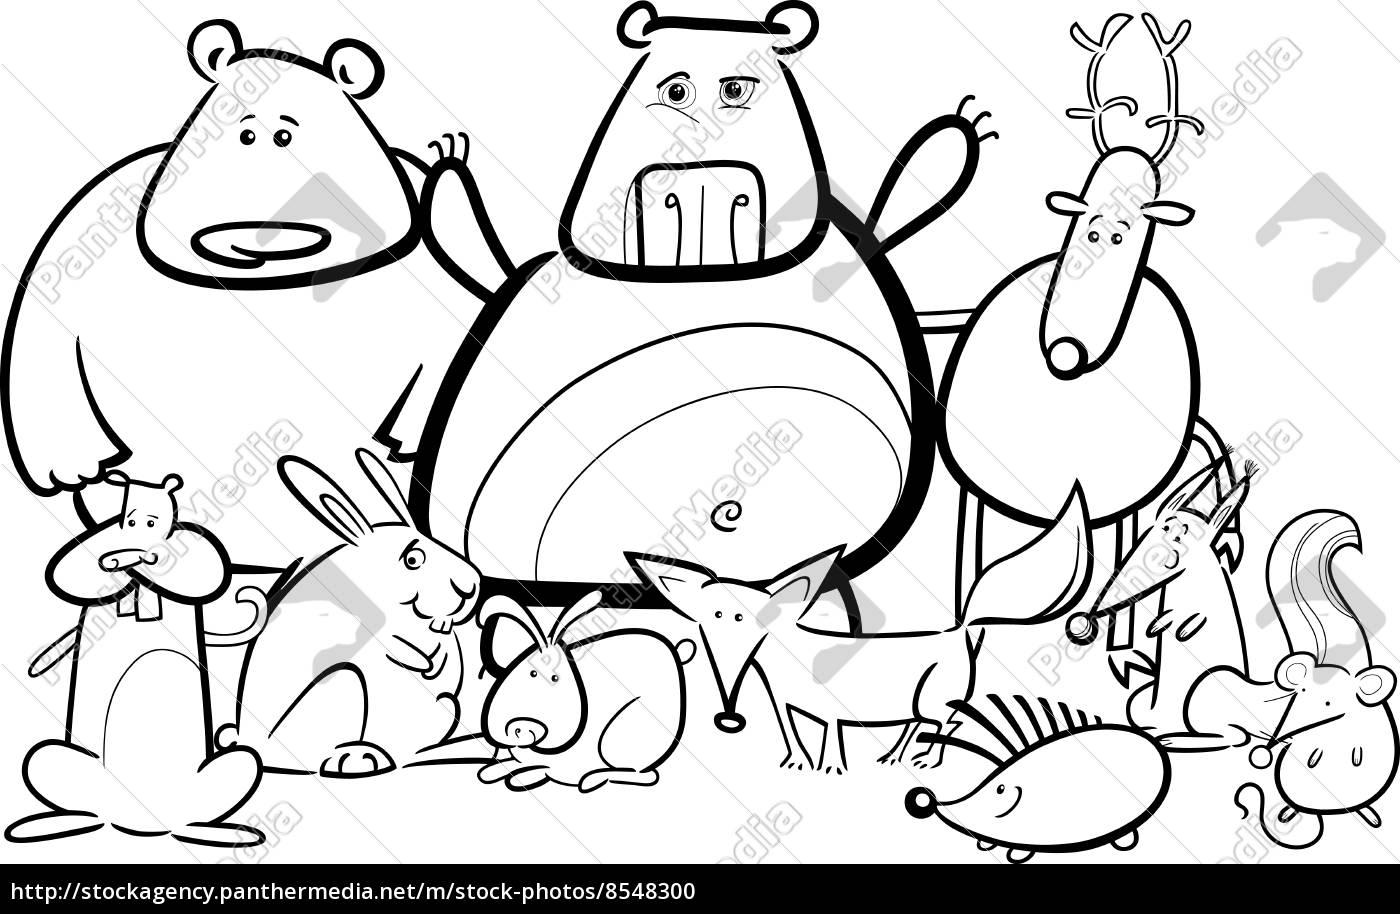 Stockphoto 8548300 Dibujo Animado Grupo De Animales Salvajes Para Colorear